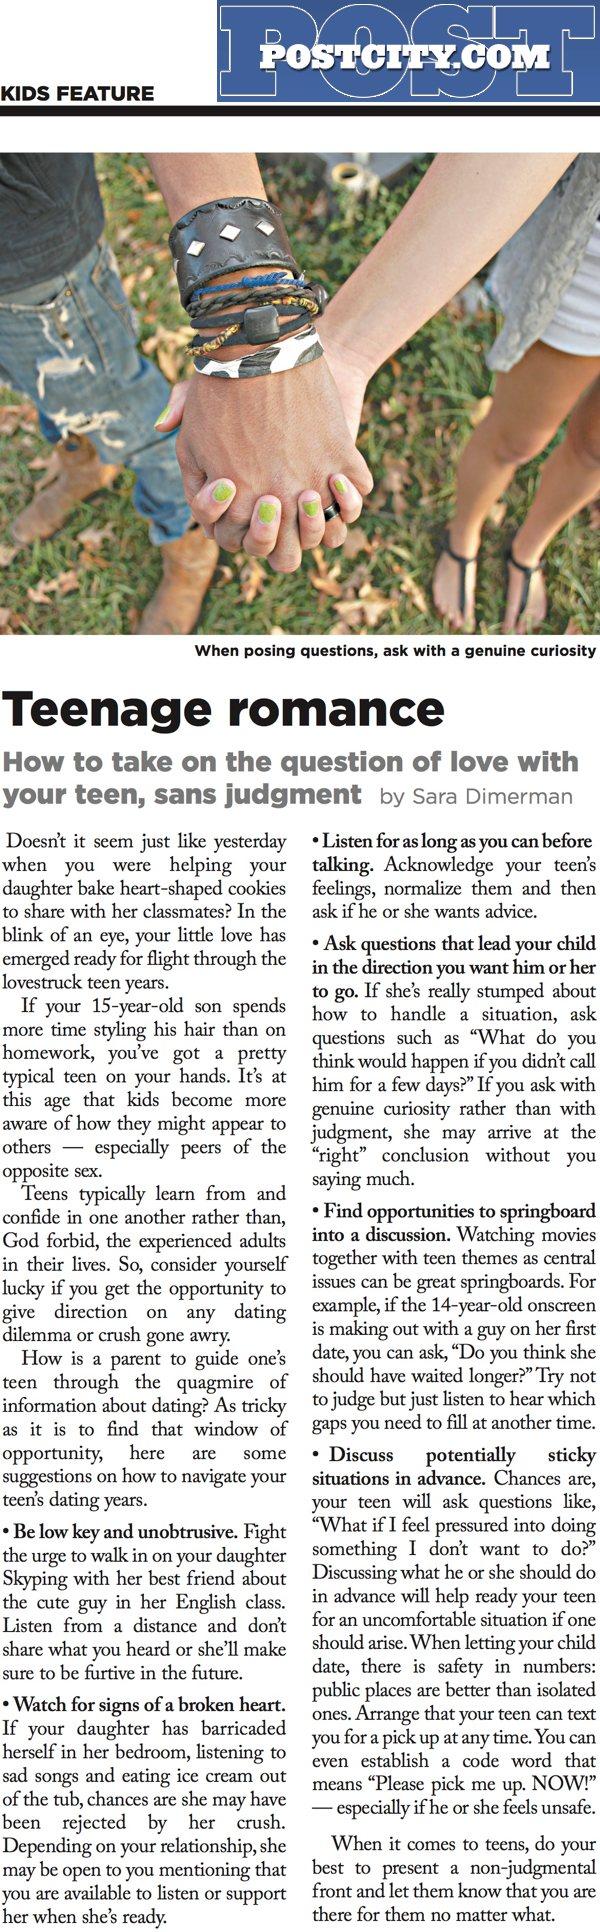 Teenage romance article